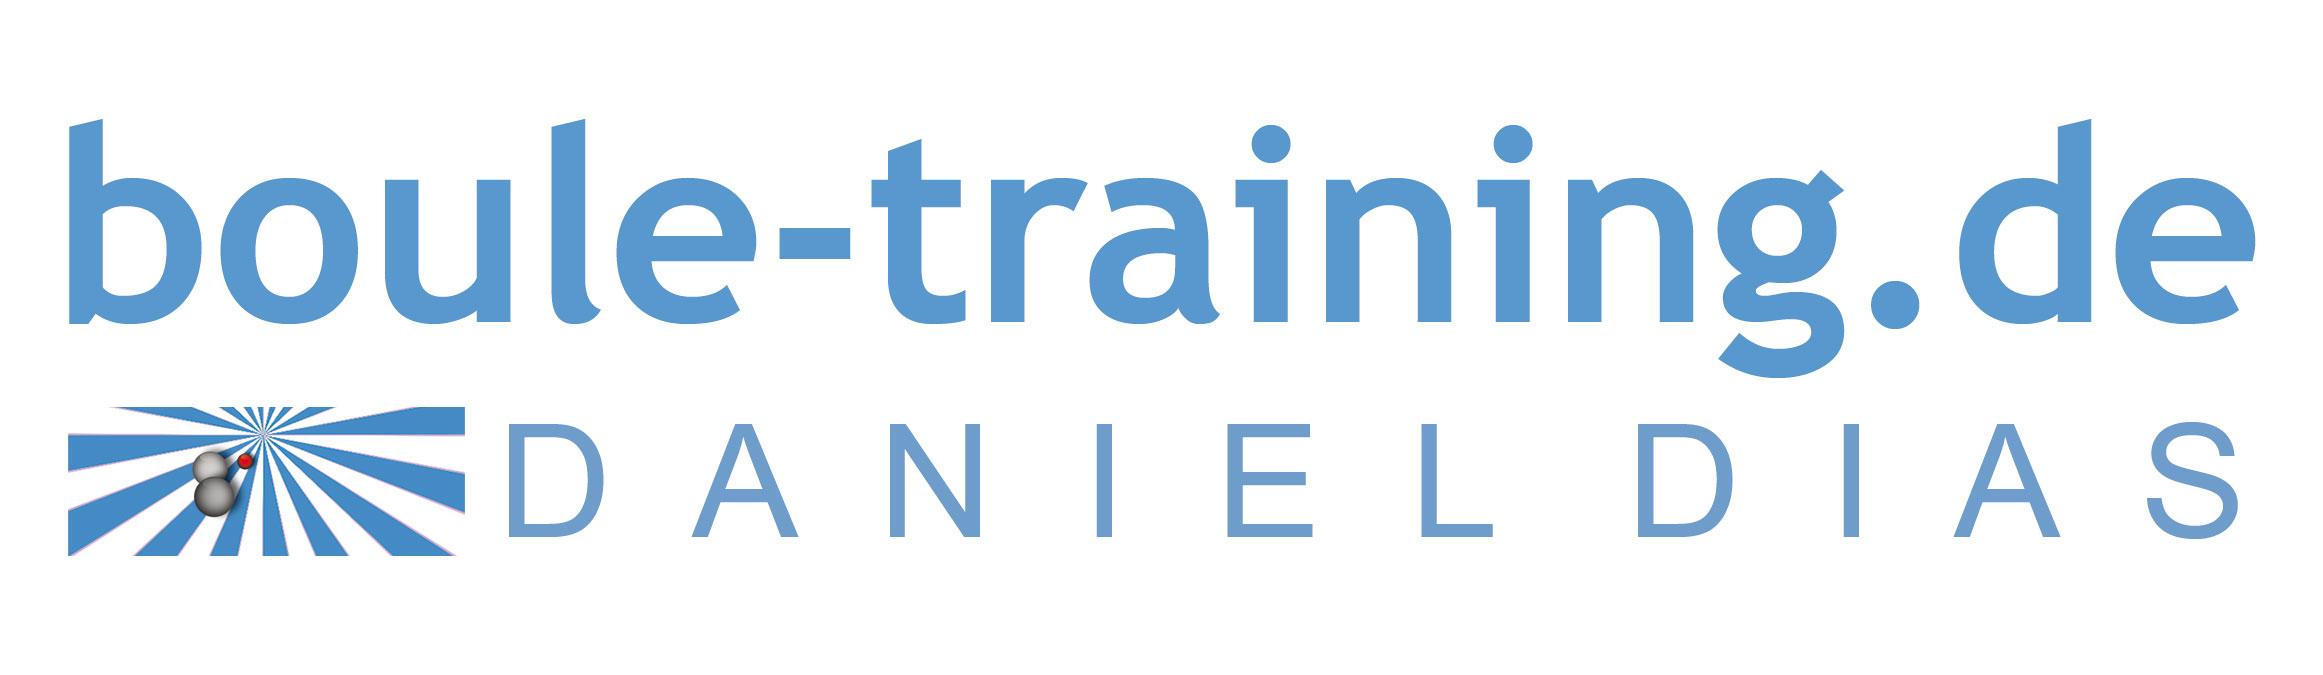 boule-training_de